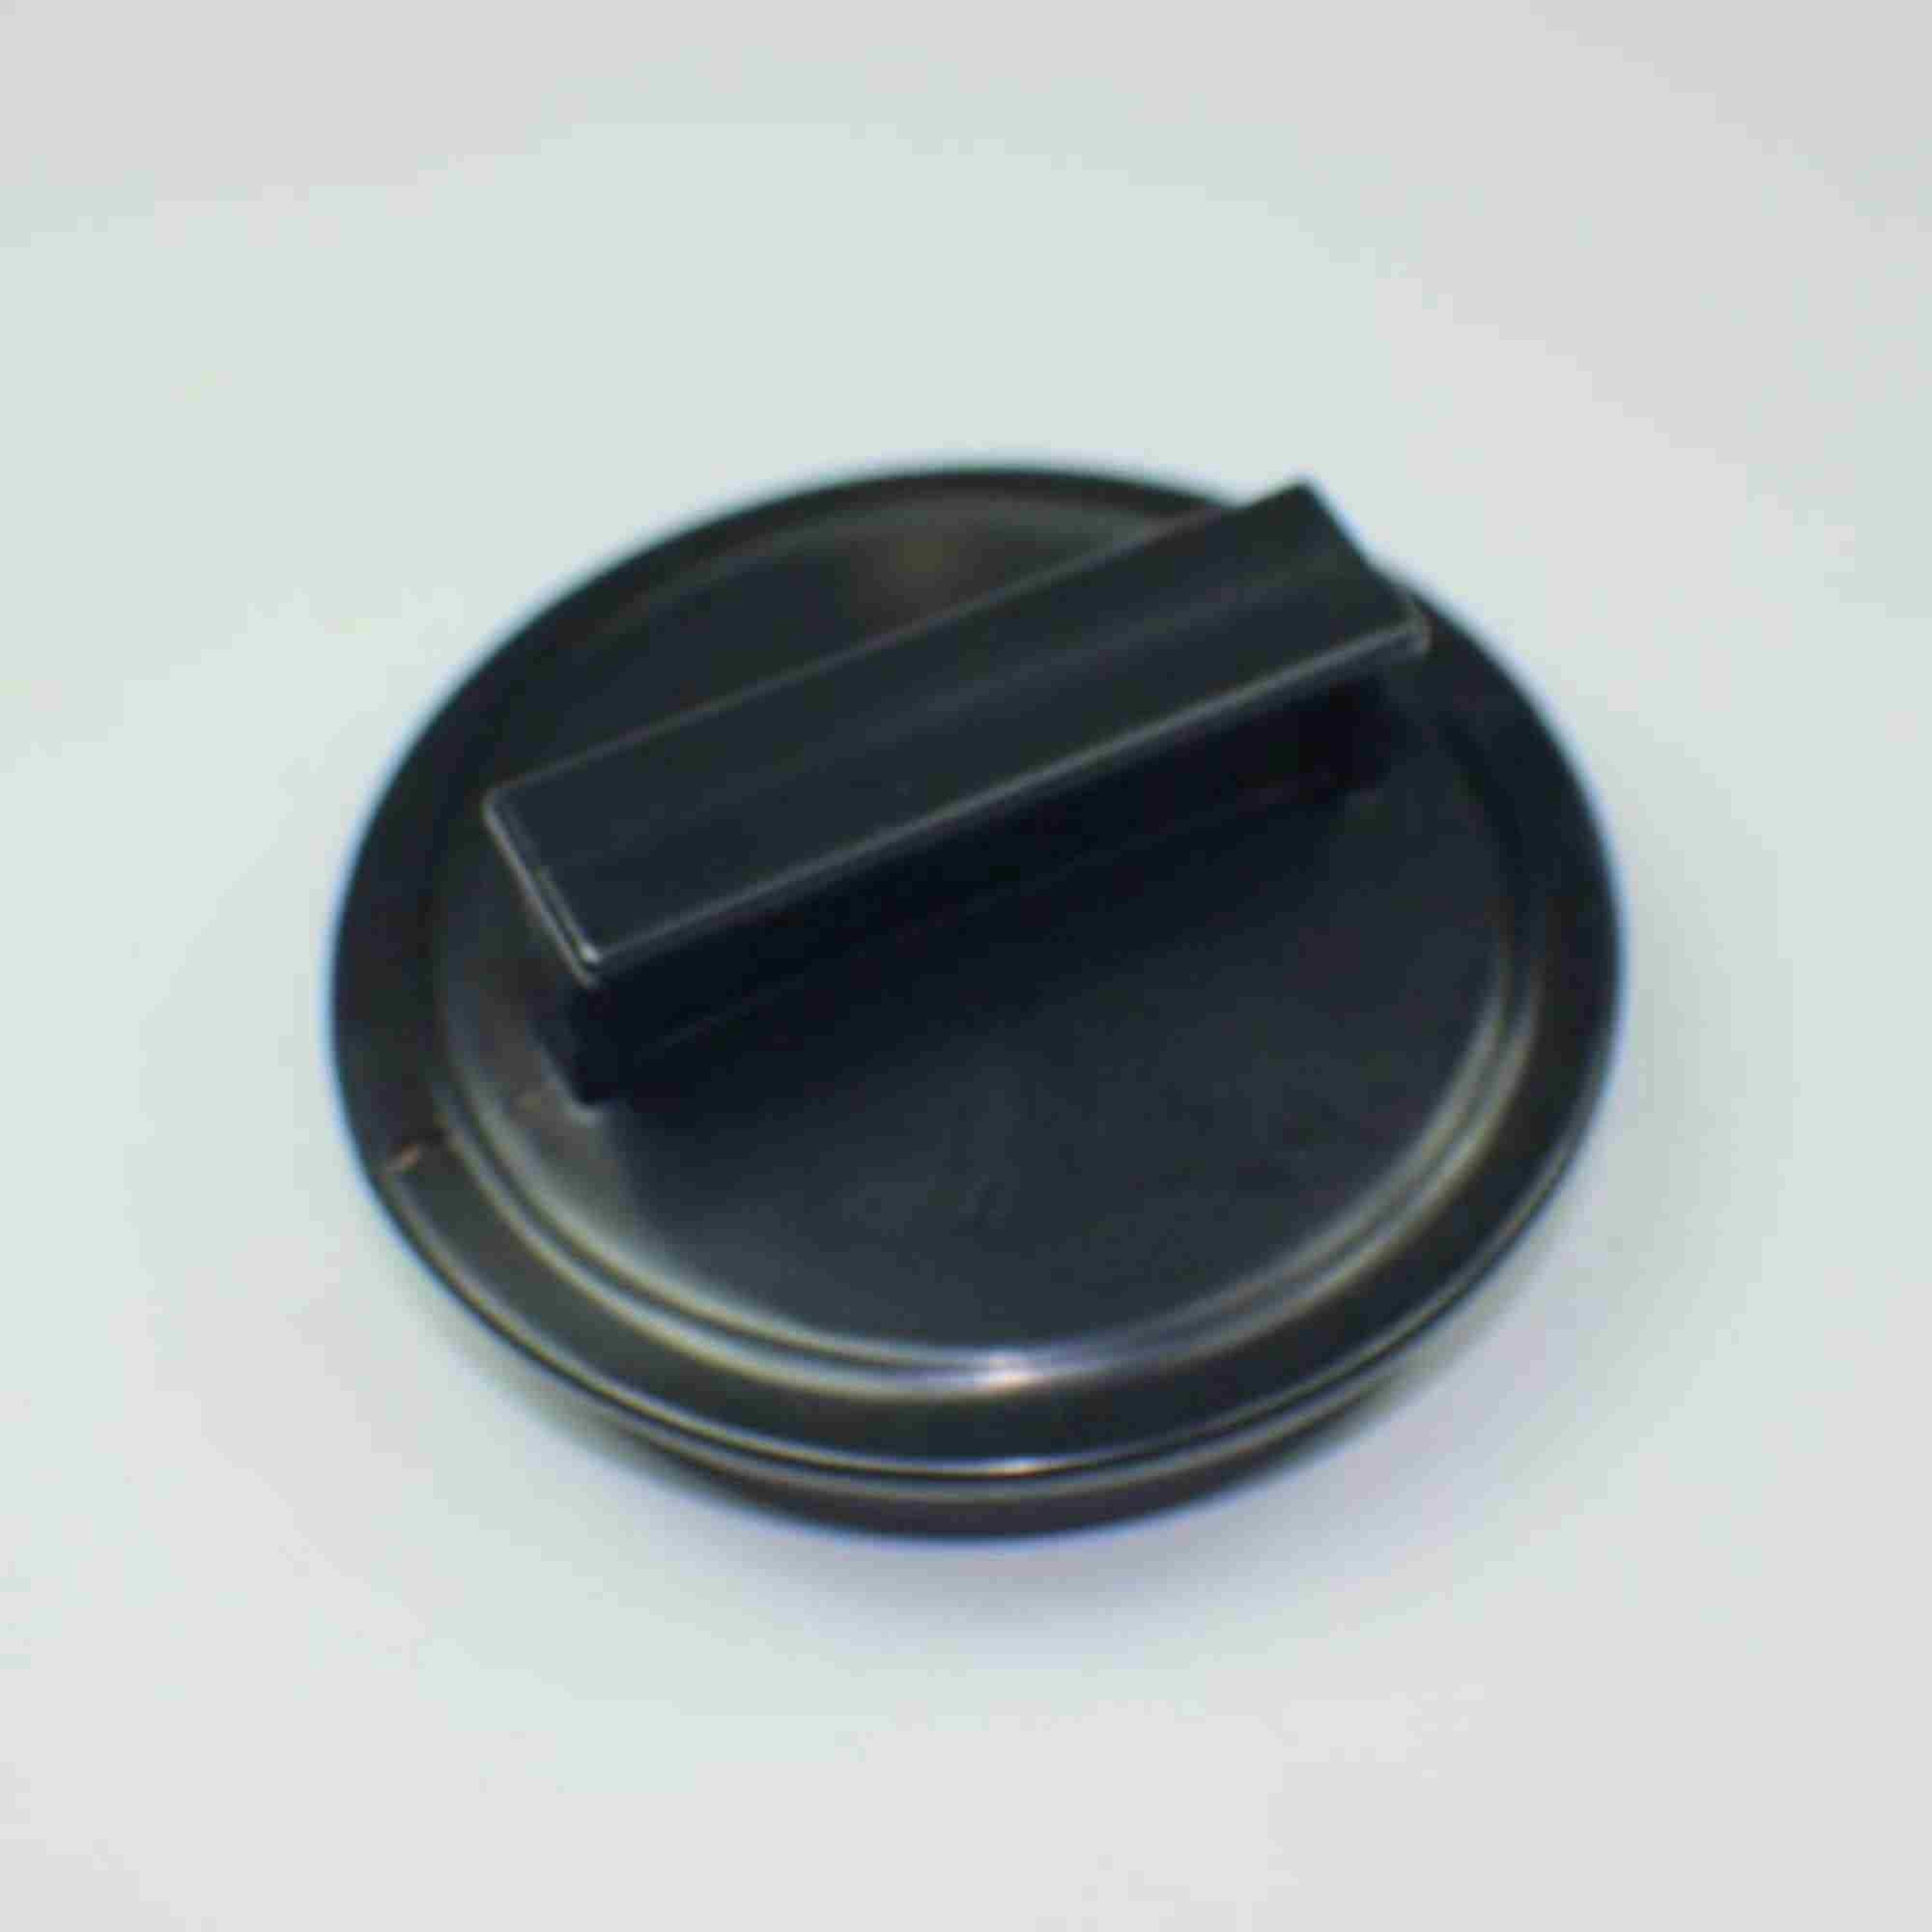 Ge WC11X10003 Garbage Disposal Drain Stopper Genuine Original Equipment Manufacturer (OEM) Part by GE